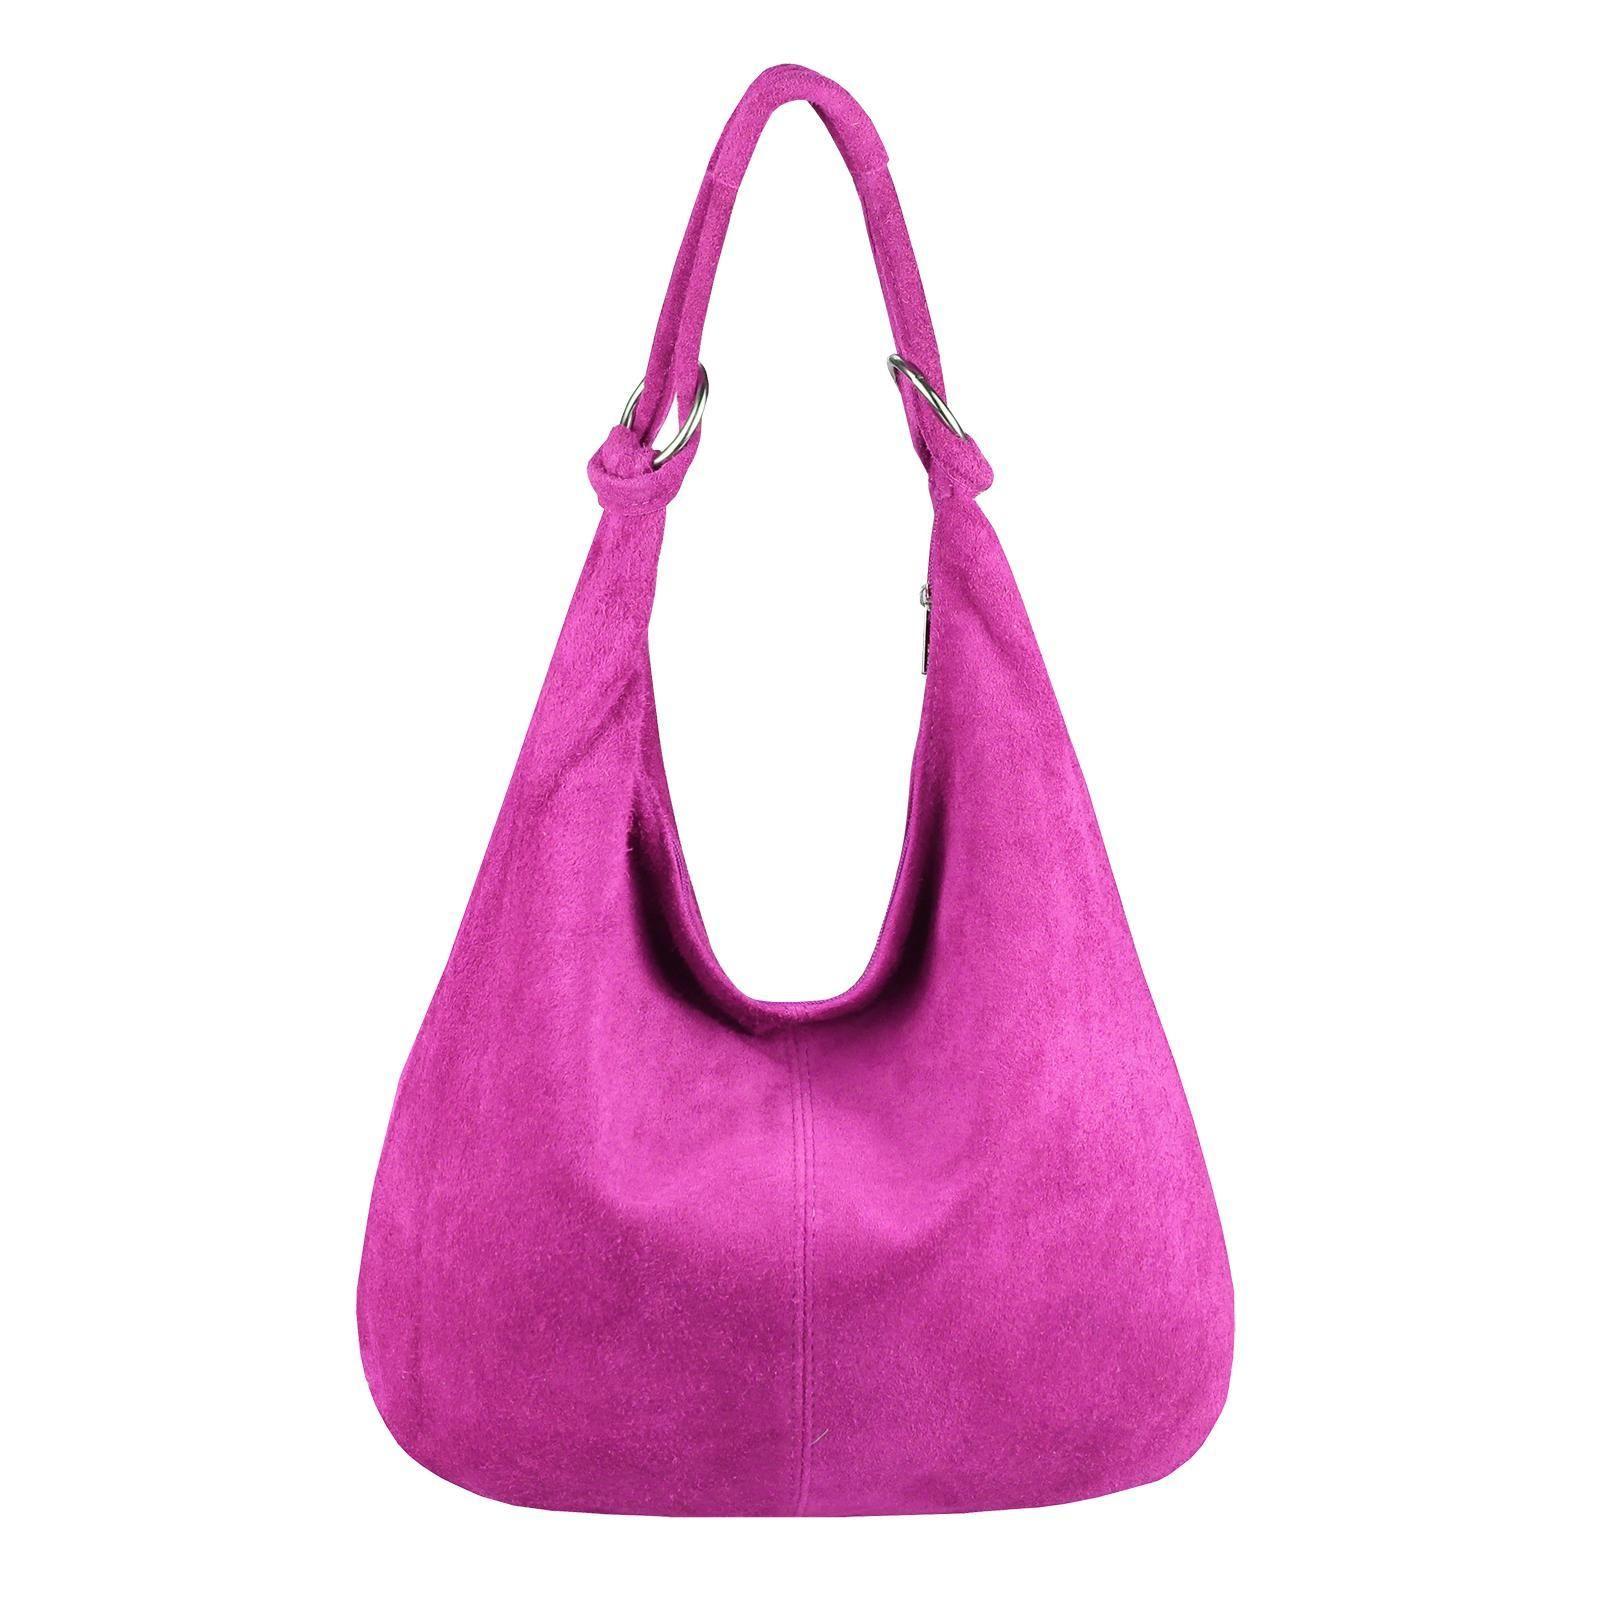 4559ce712b28fd Made in Italy Damen XXL Ledertasche Wildleder Shopper Tasche Schultertasche  Umhängetasche Hobo-Bag Beuteltasche 41x34x12